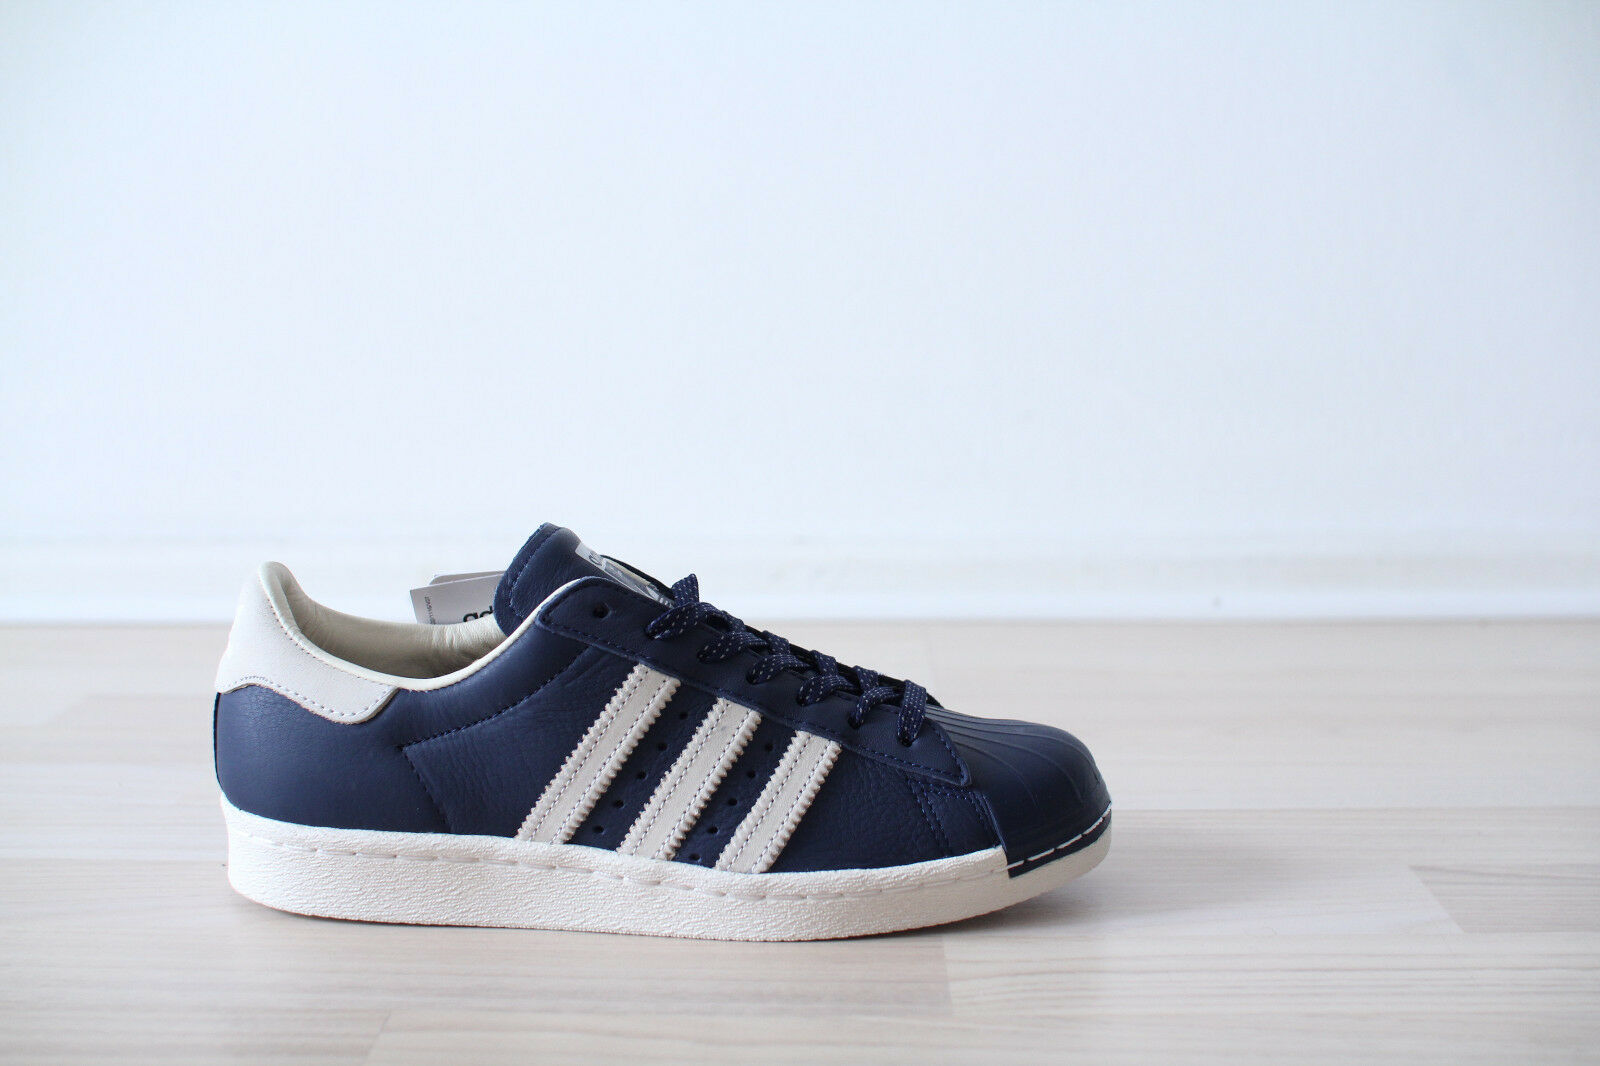 Adidas Superstar 80s blue white Gr. 37,38,39,40,41,42 NEU & OVP